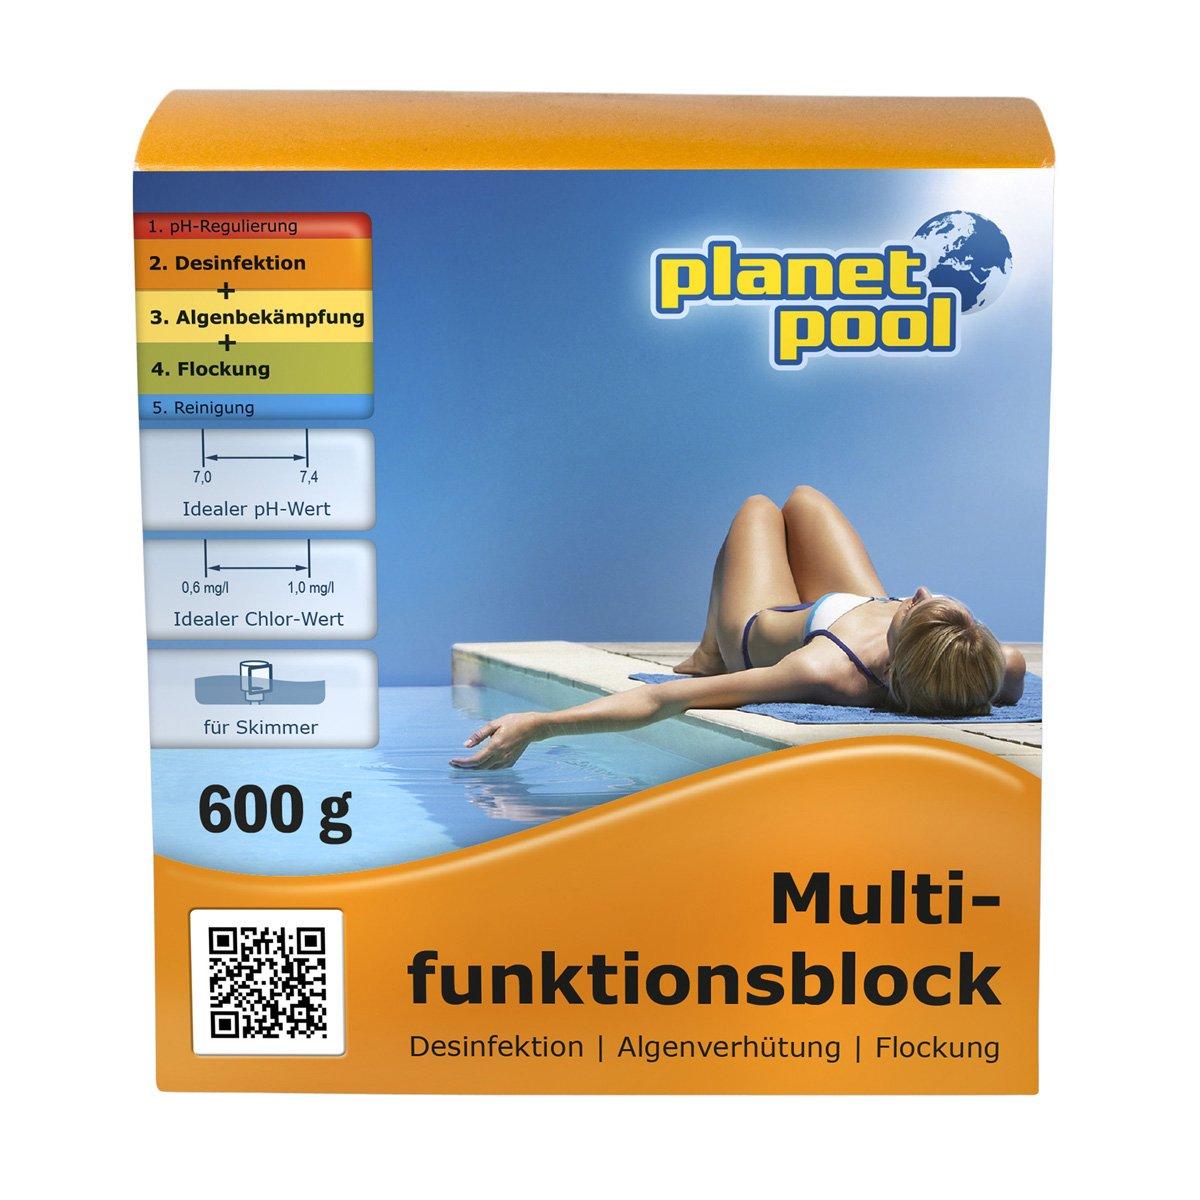 PLANET POOL Multifunktionsblock 600g